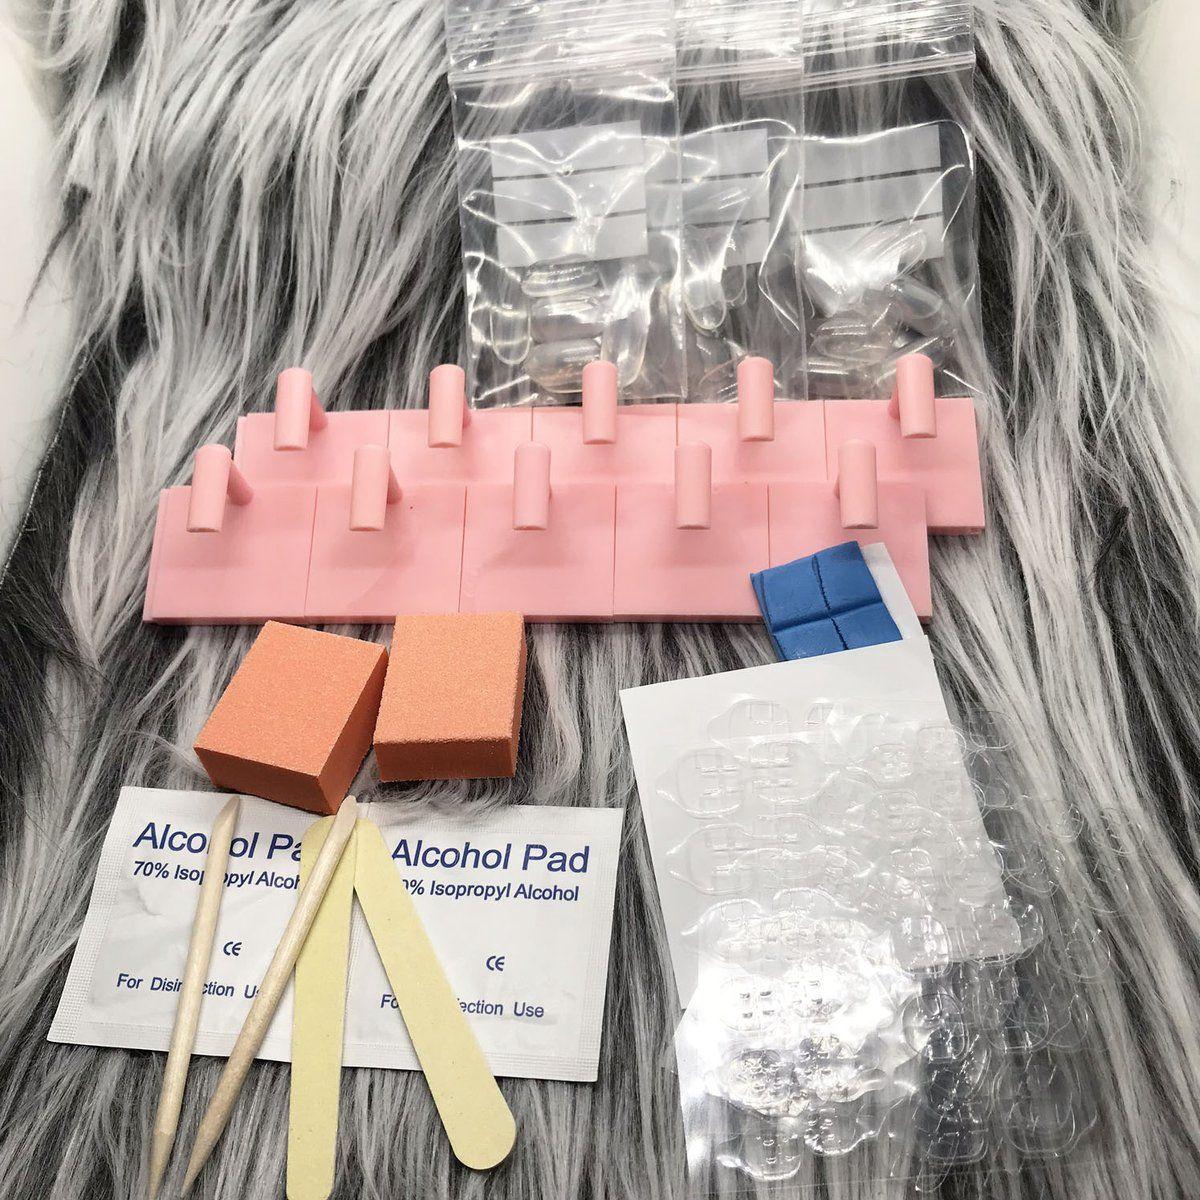 Diy Acrylic Nails Easy At Home Diy Acrylic Nails Acrylic Nails At Home Diy Nail Designs